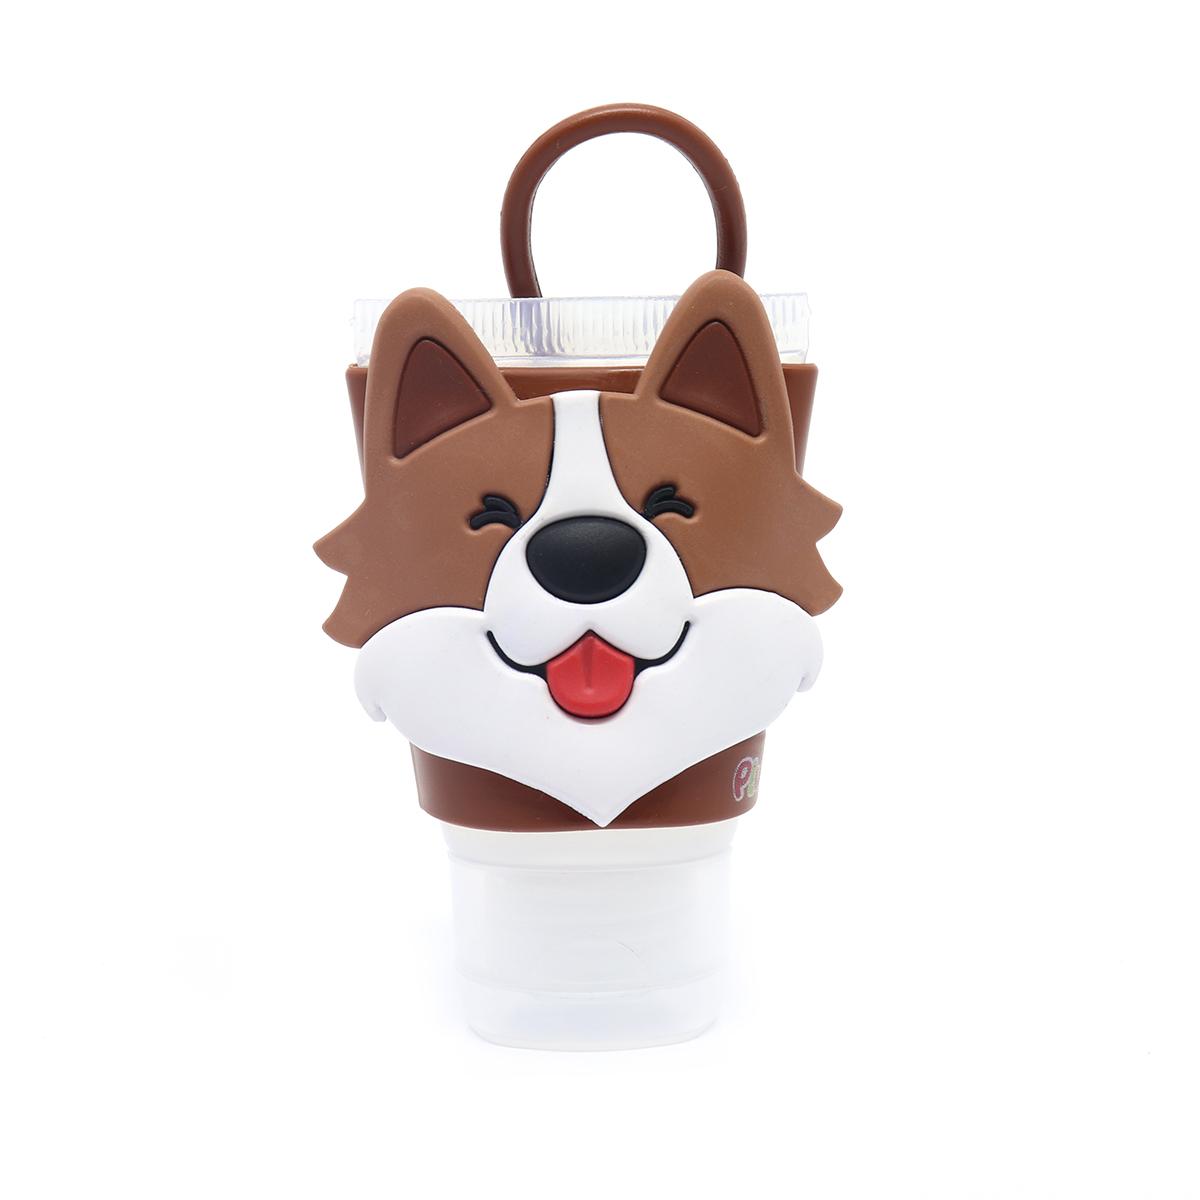 Chaveiro Plugt Cachorro Corgi Marrom Sorriso + Frasco 30ml